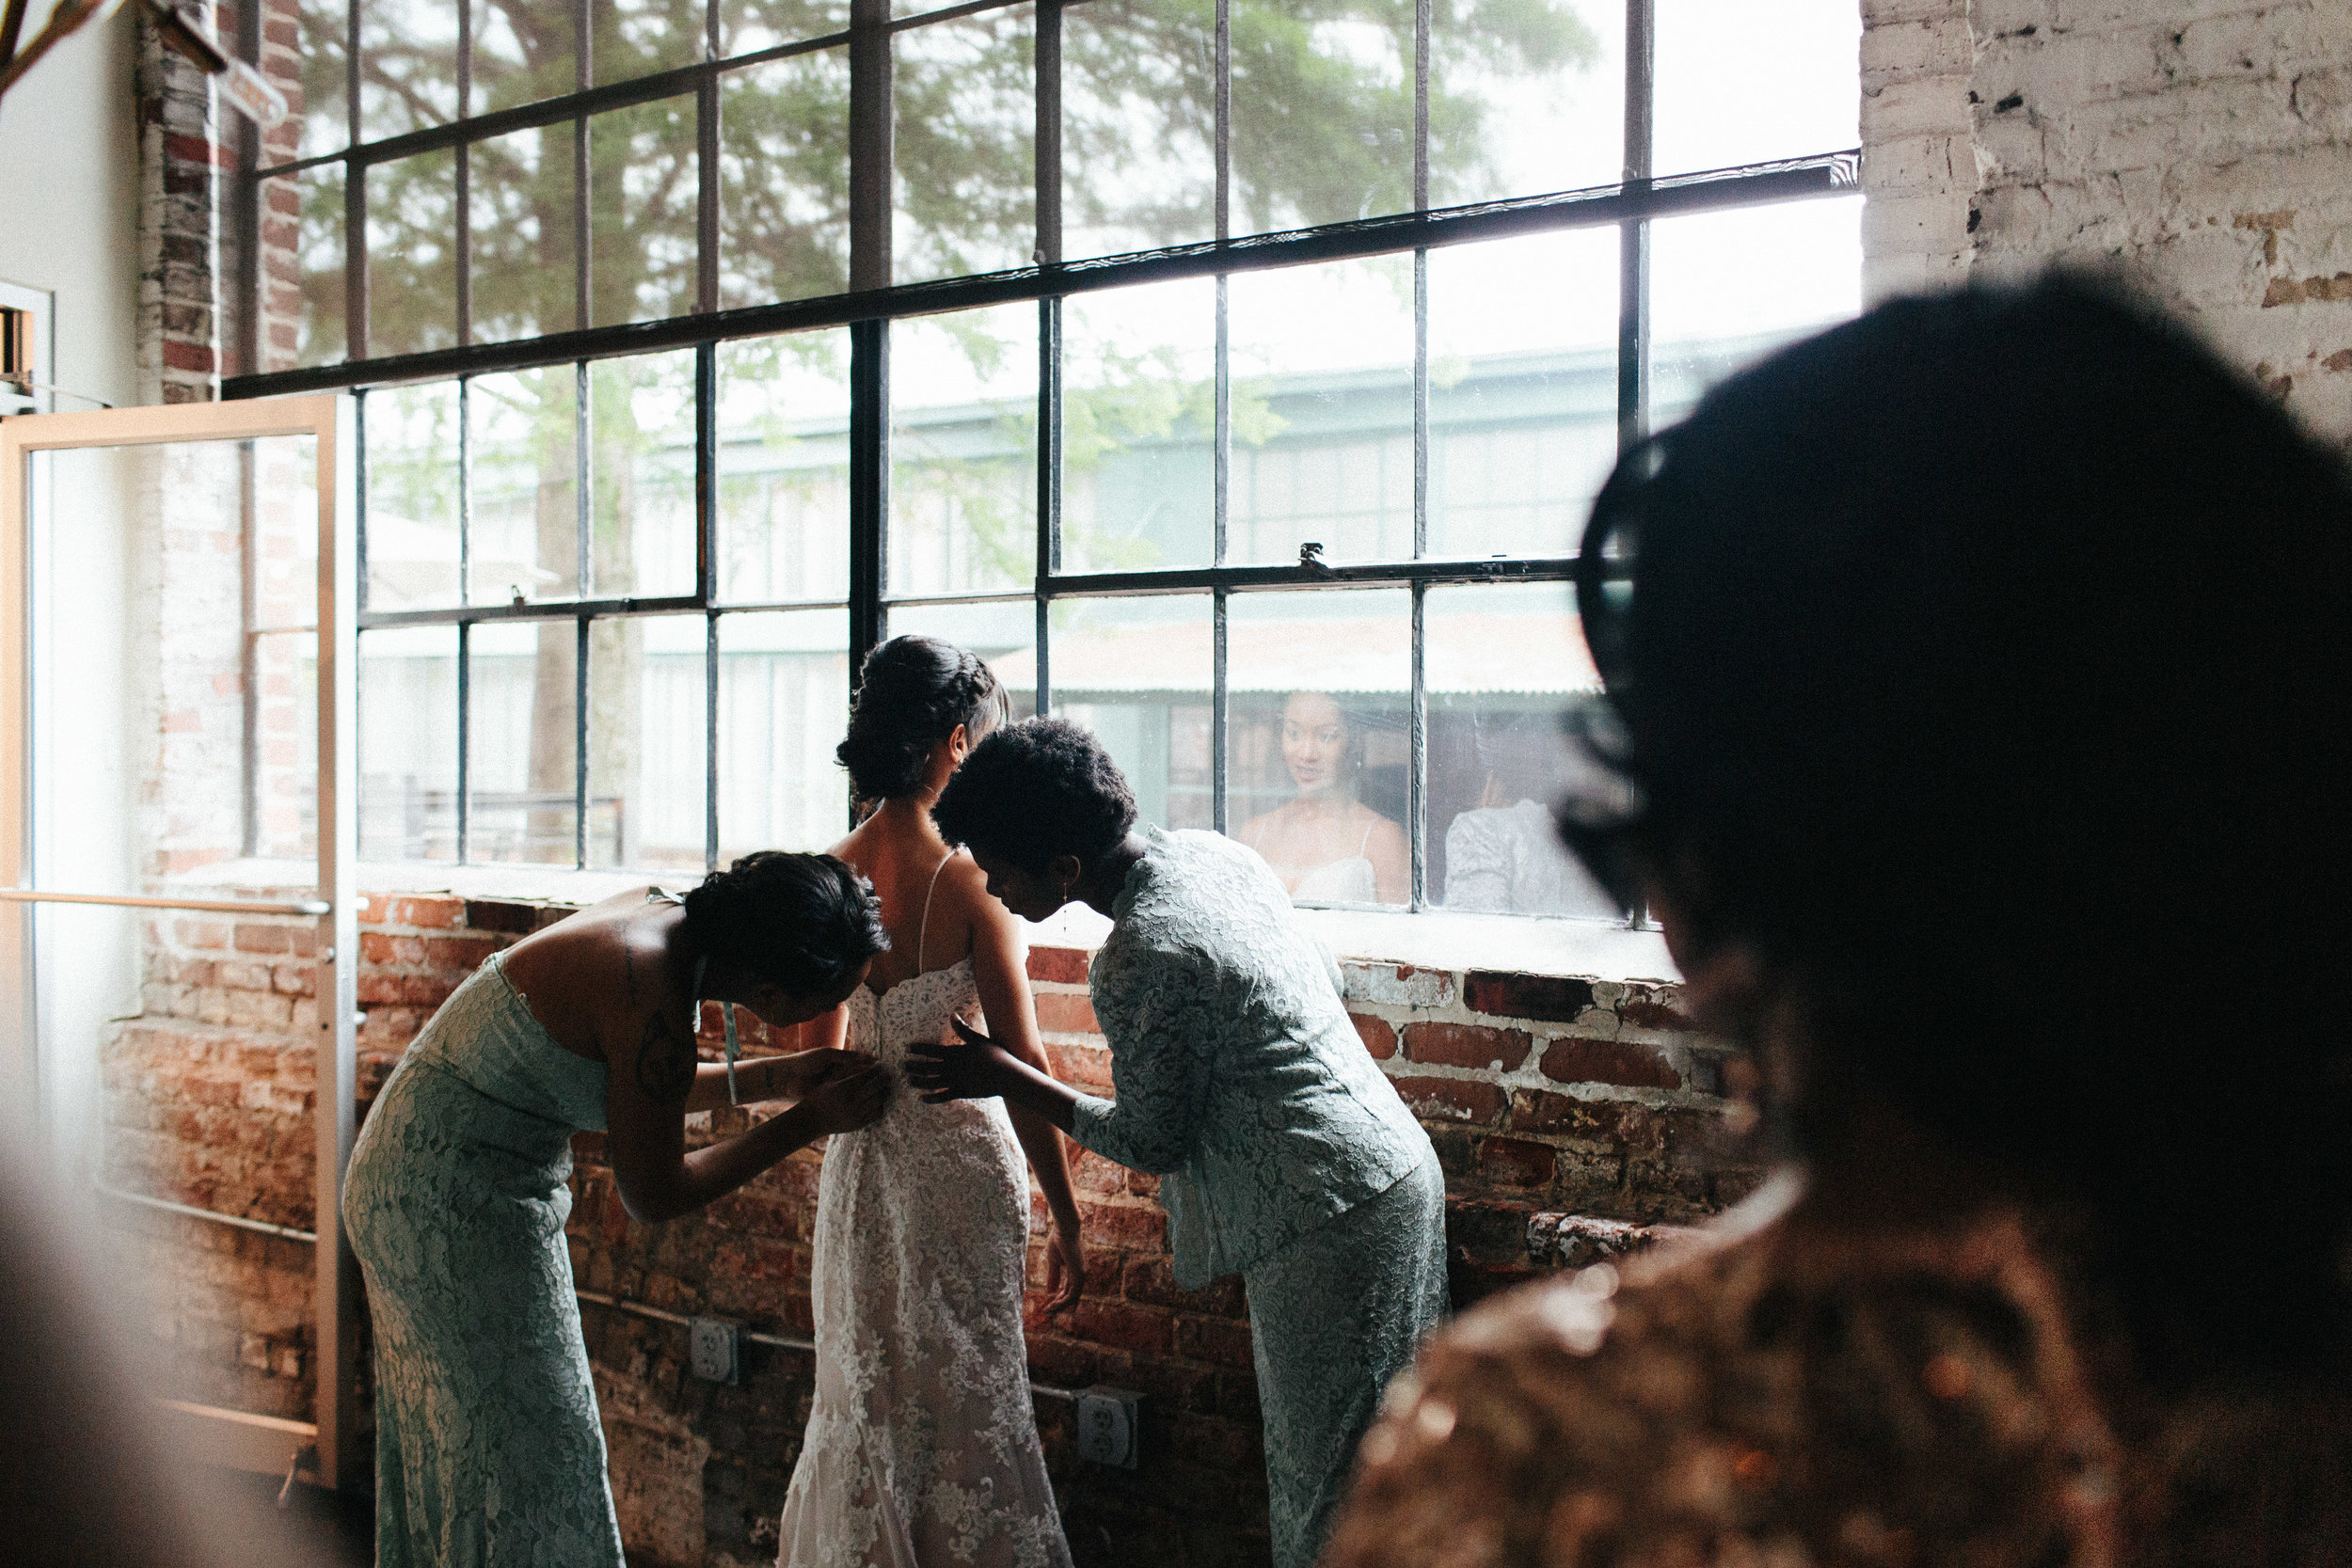 king_plow_atlanta_wedding_art_gallery_modern_lifestyle_documentary_1129.jpg